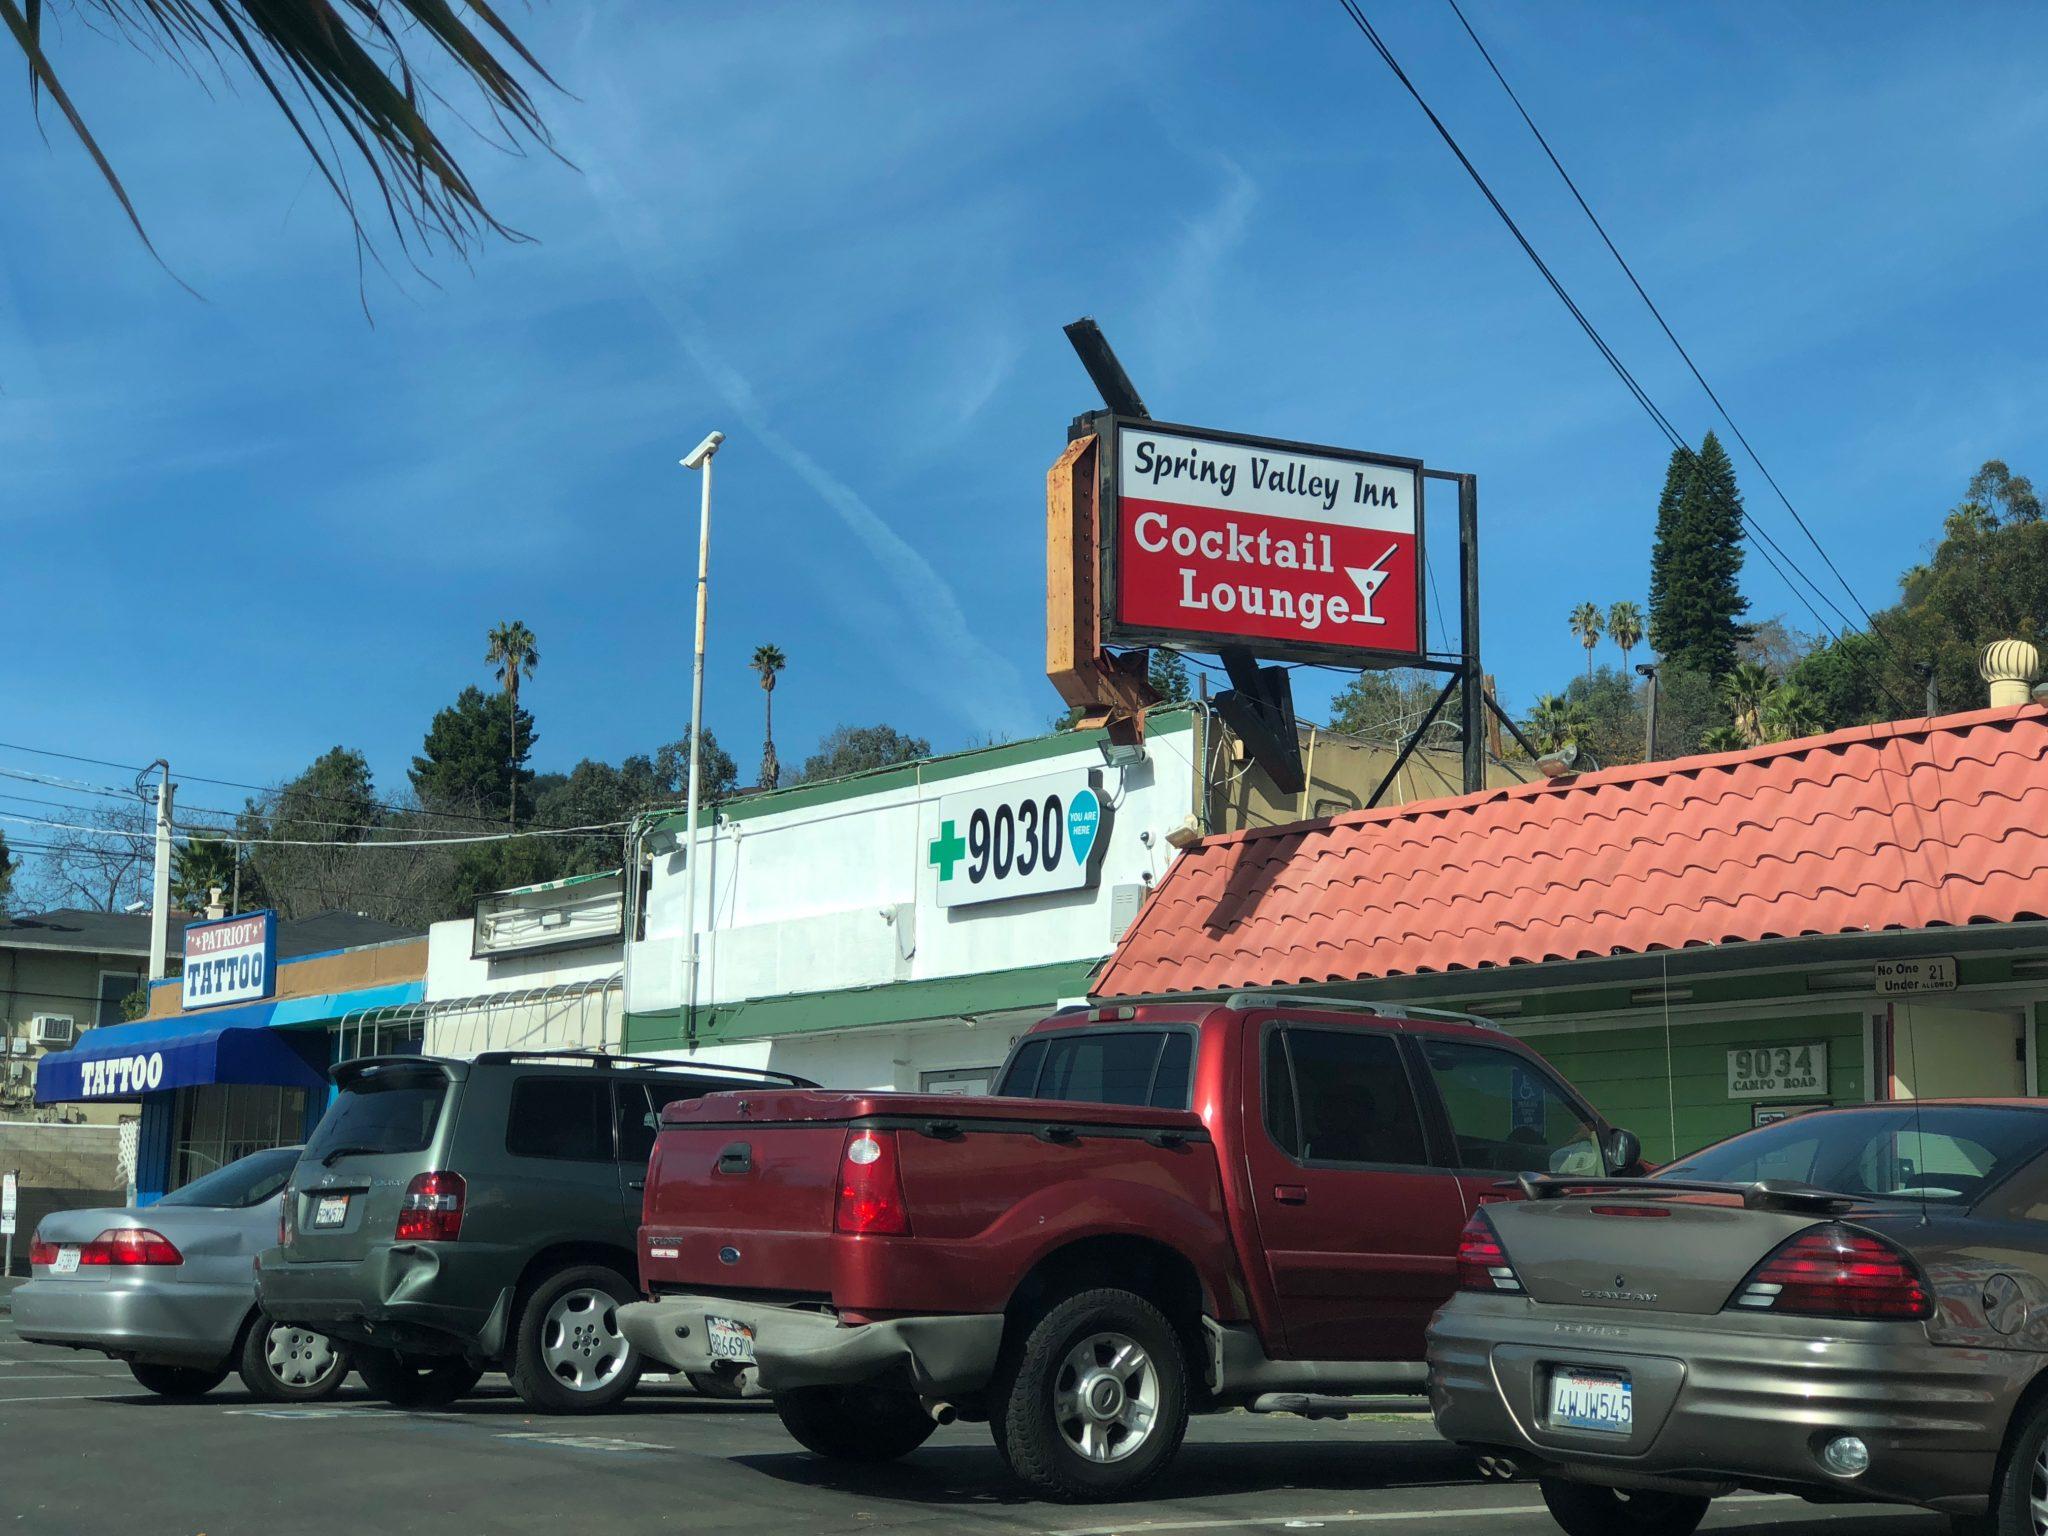 An illegal marijuana dispensary near the border of Spring Valley and Casa de Oro. / Photo by Kinsee Morlan